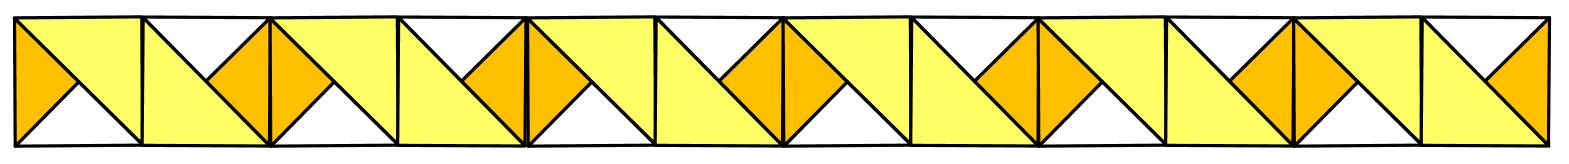 Diagram 4 Rainbow Ribbons Quilt